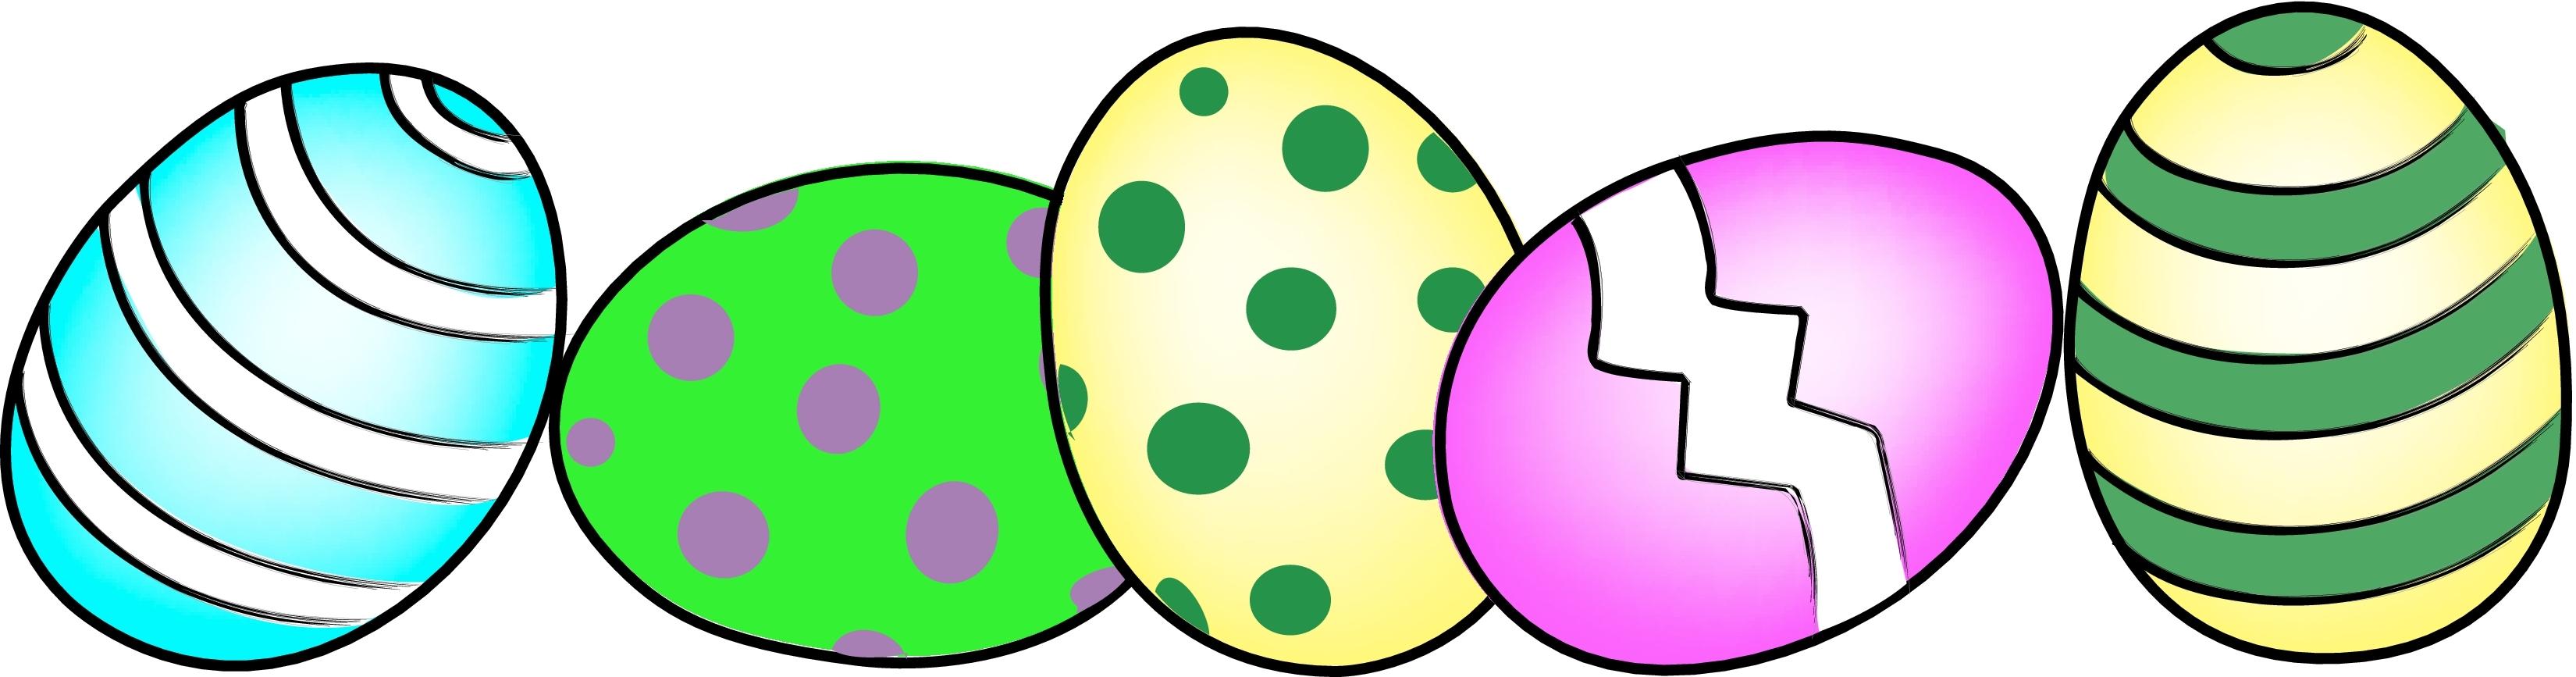 Microsoft Easter Eggs Clipart.